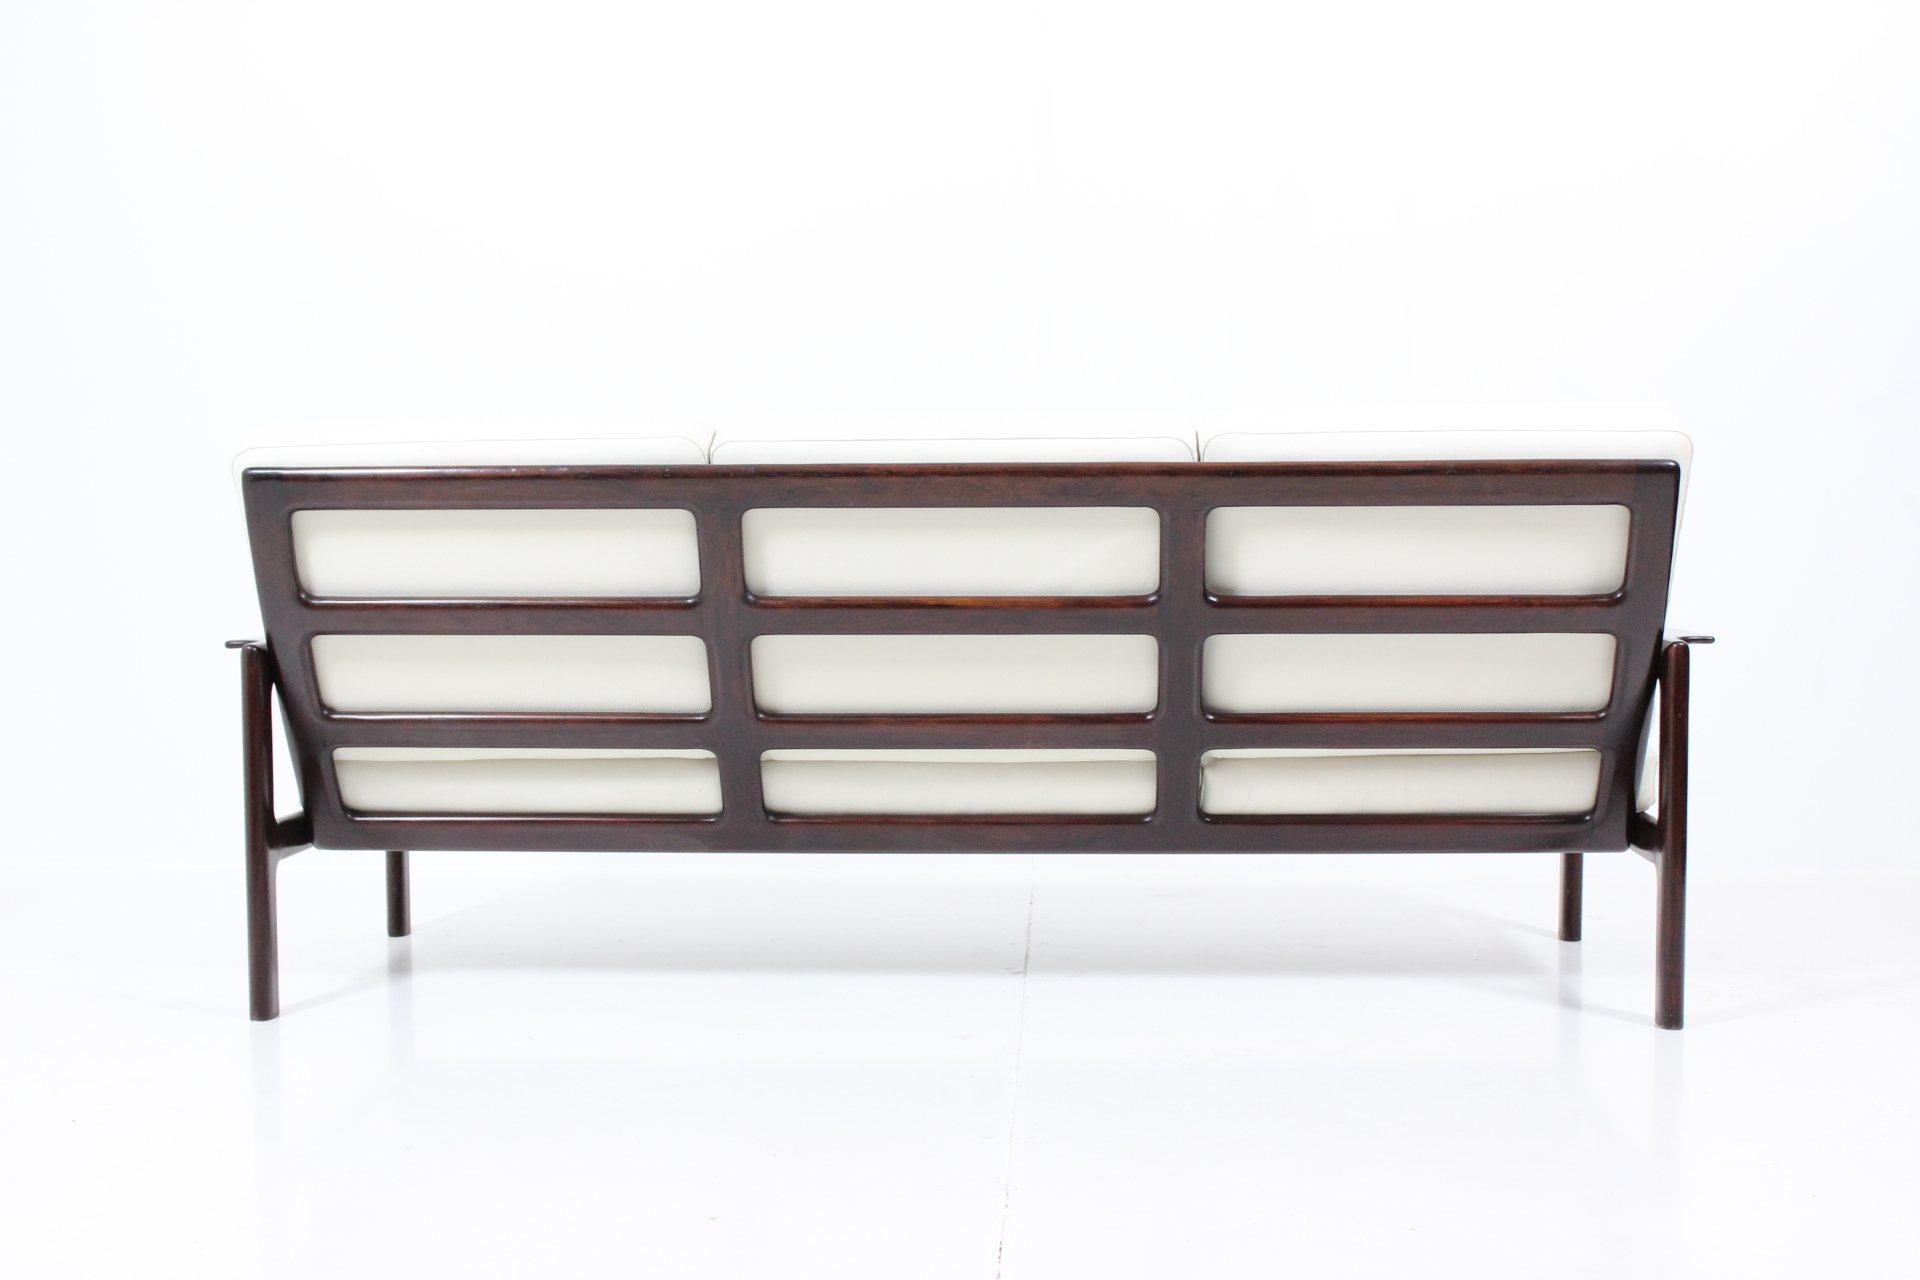 Retro Vintage Classic Mid-Century Cushion Sofa by Illum Wikkelsø